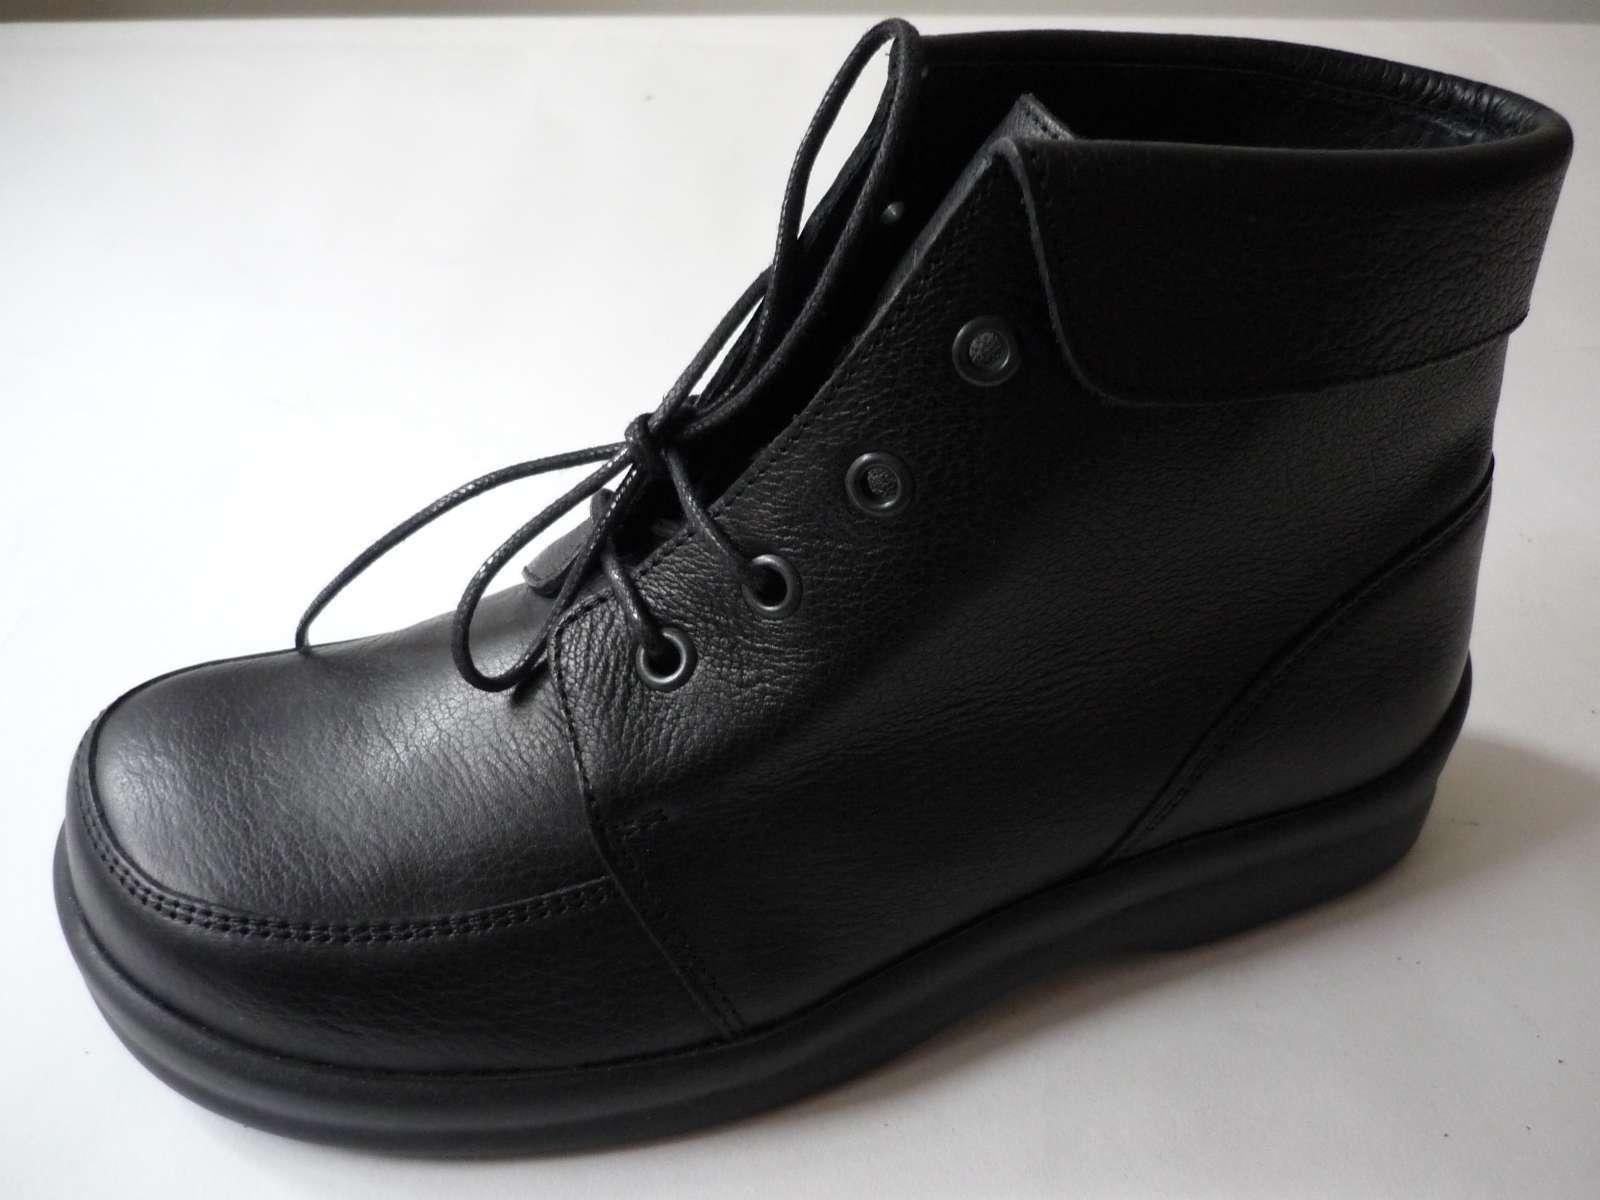 FOOTPRINTS Leder TORINO Birkenstock FB 36 Leder FOOTPRINTS Stiefel Schwarz Normal NEU 9e5392